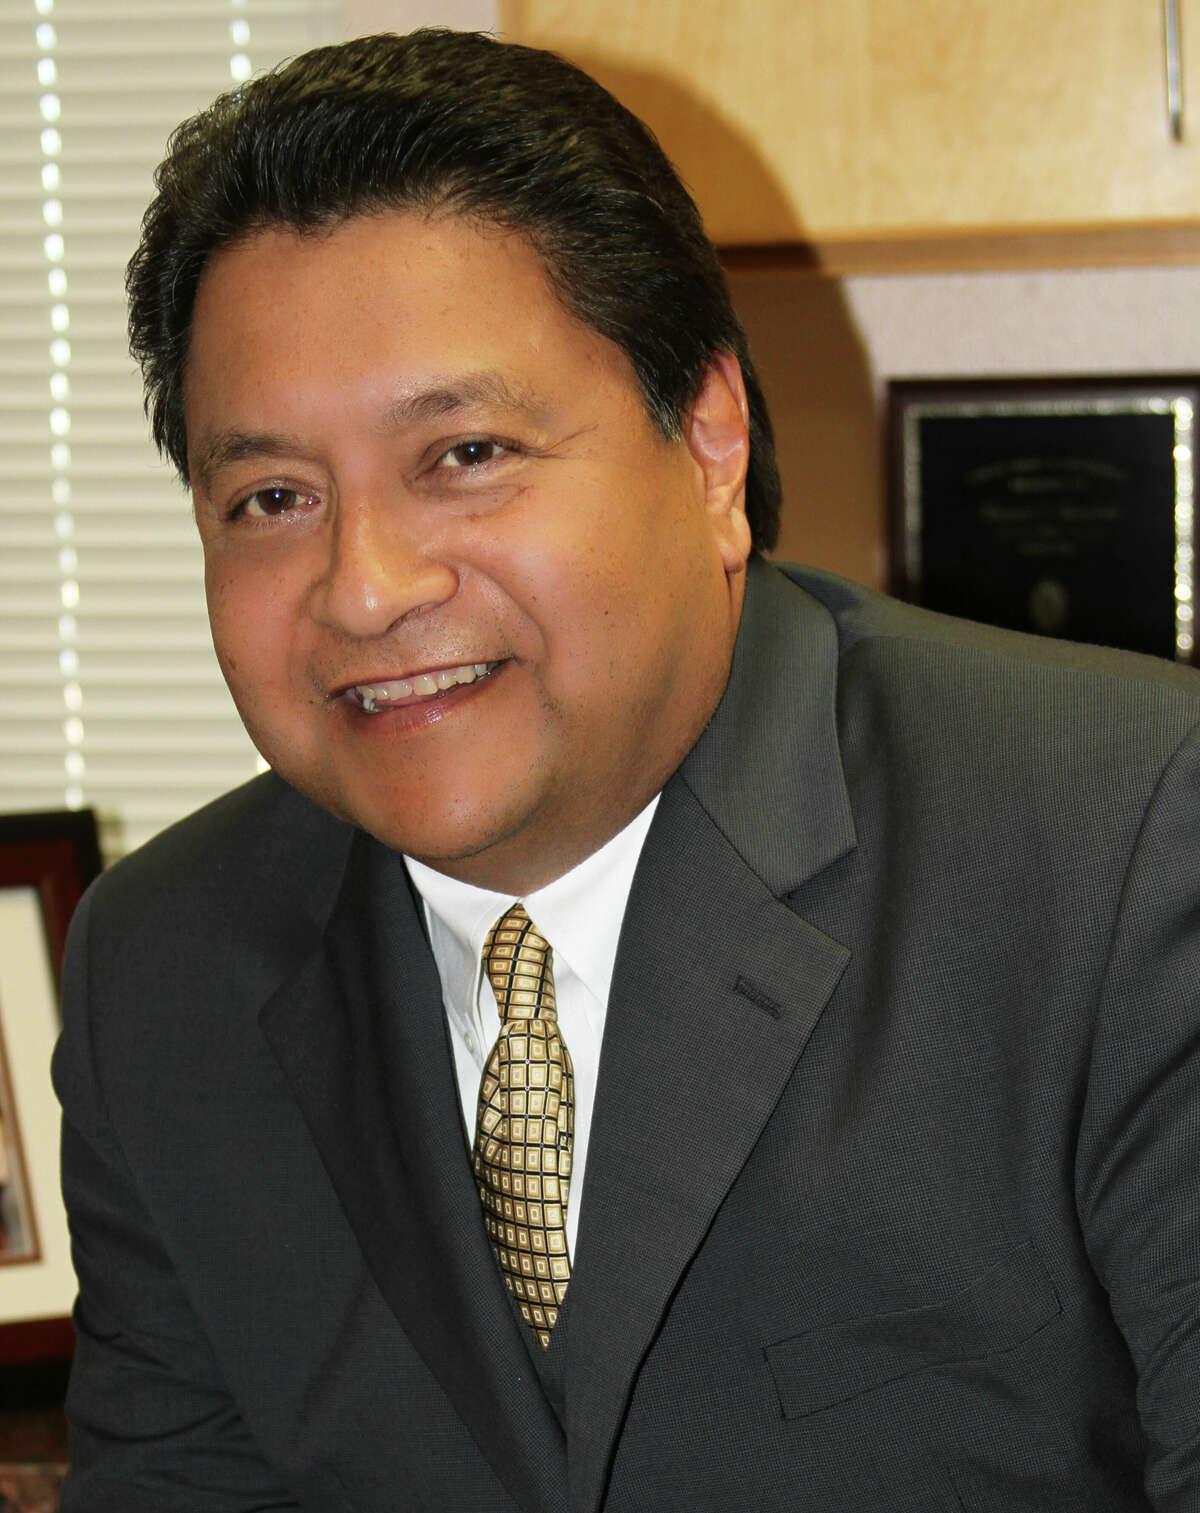 Dr. Manuel L. Isquierdo finalist for Superintendent SAISD.